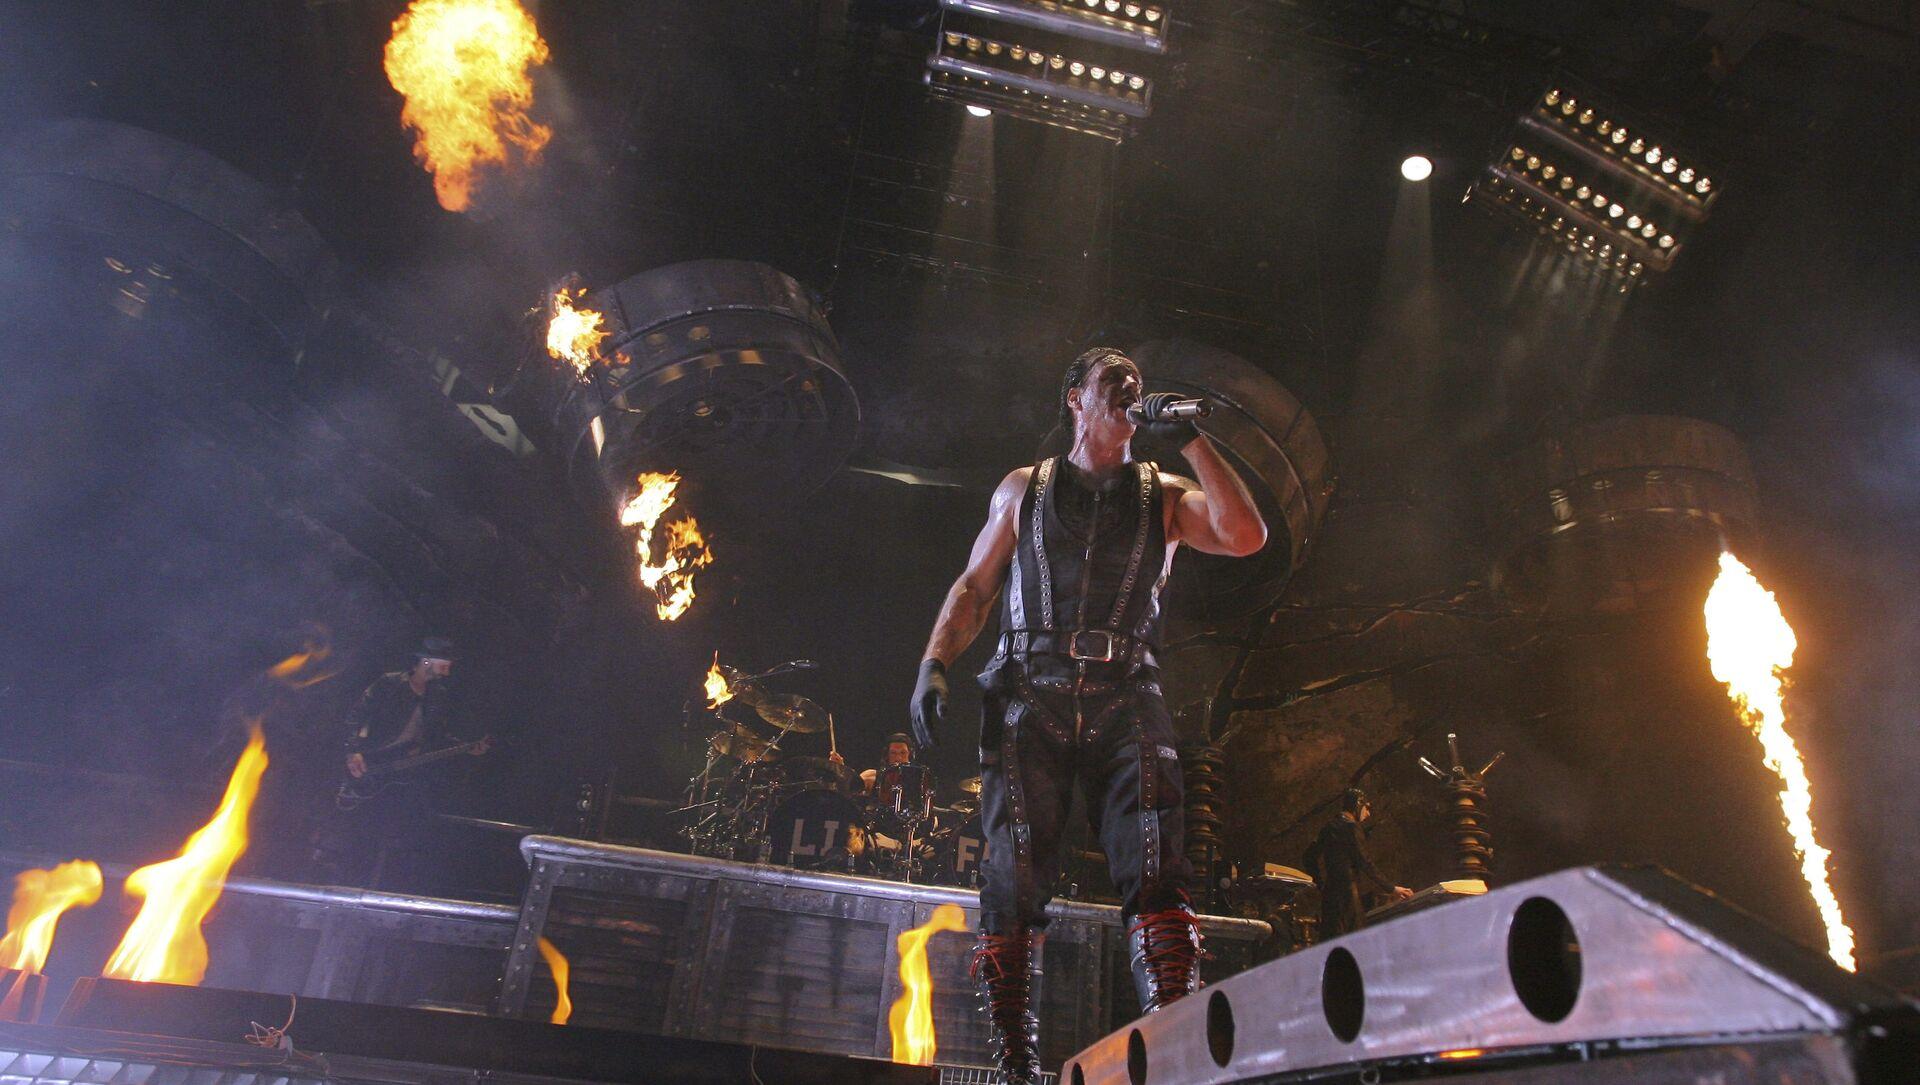 Till Lindemann of Rammstein performs in Moscow's Olympiisky concert hall, Sunday Feb. 28, 2010. - Sputnik International, 1920, 29.08.2021